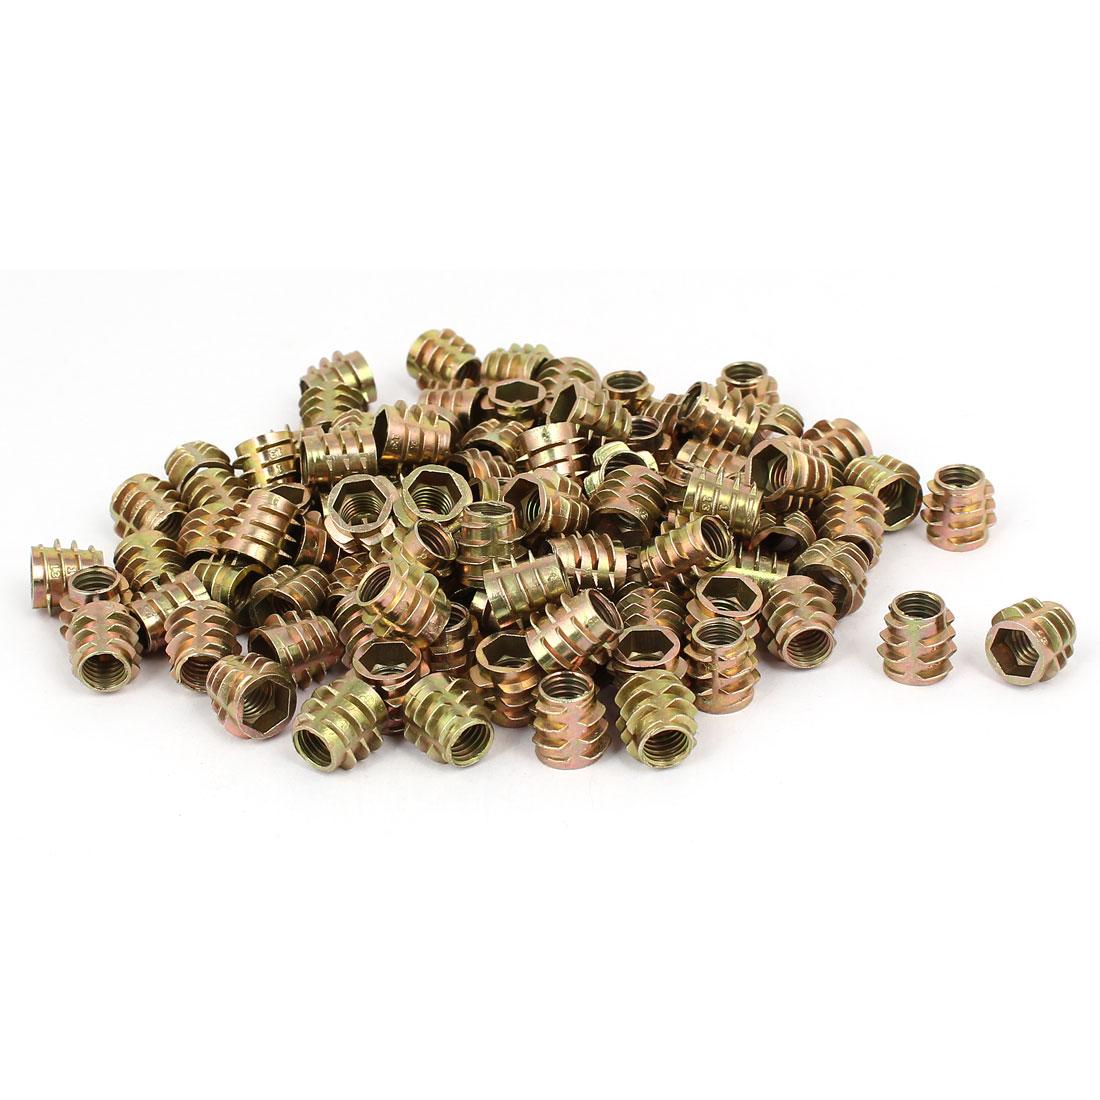 Wood Furniture Zinc Alloy Hex Socket Insert Screws E-Nuts M8x13mm 100pcs